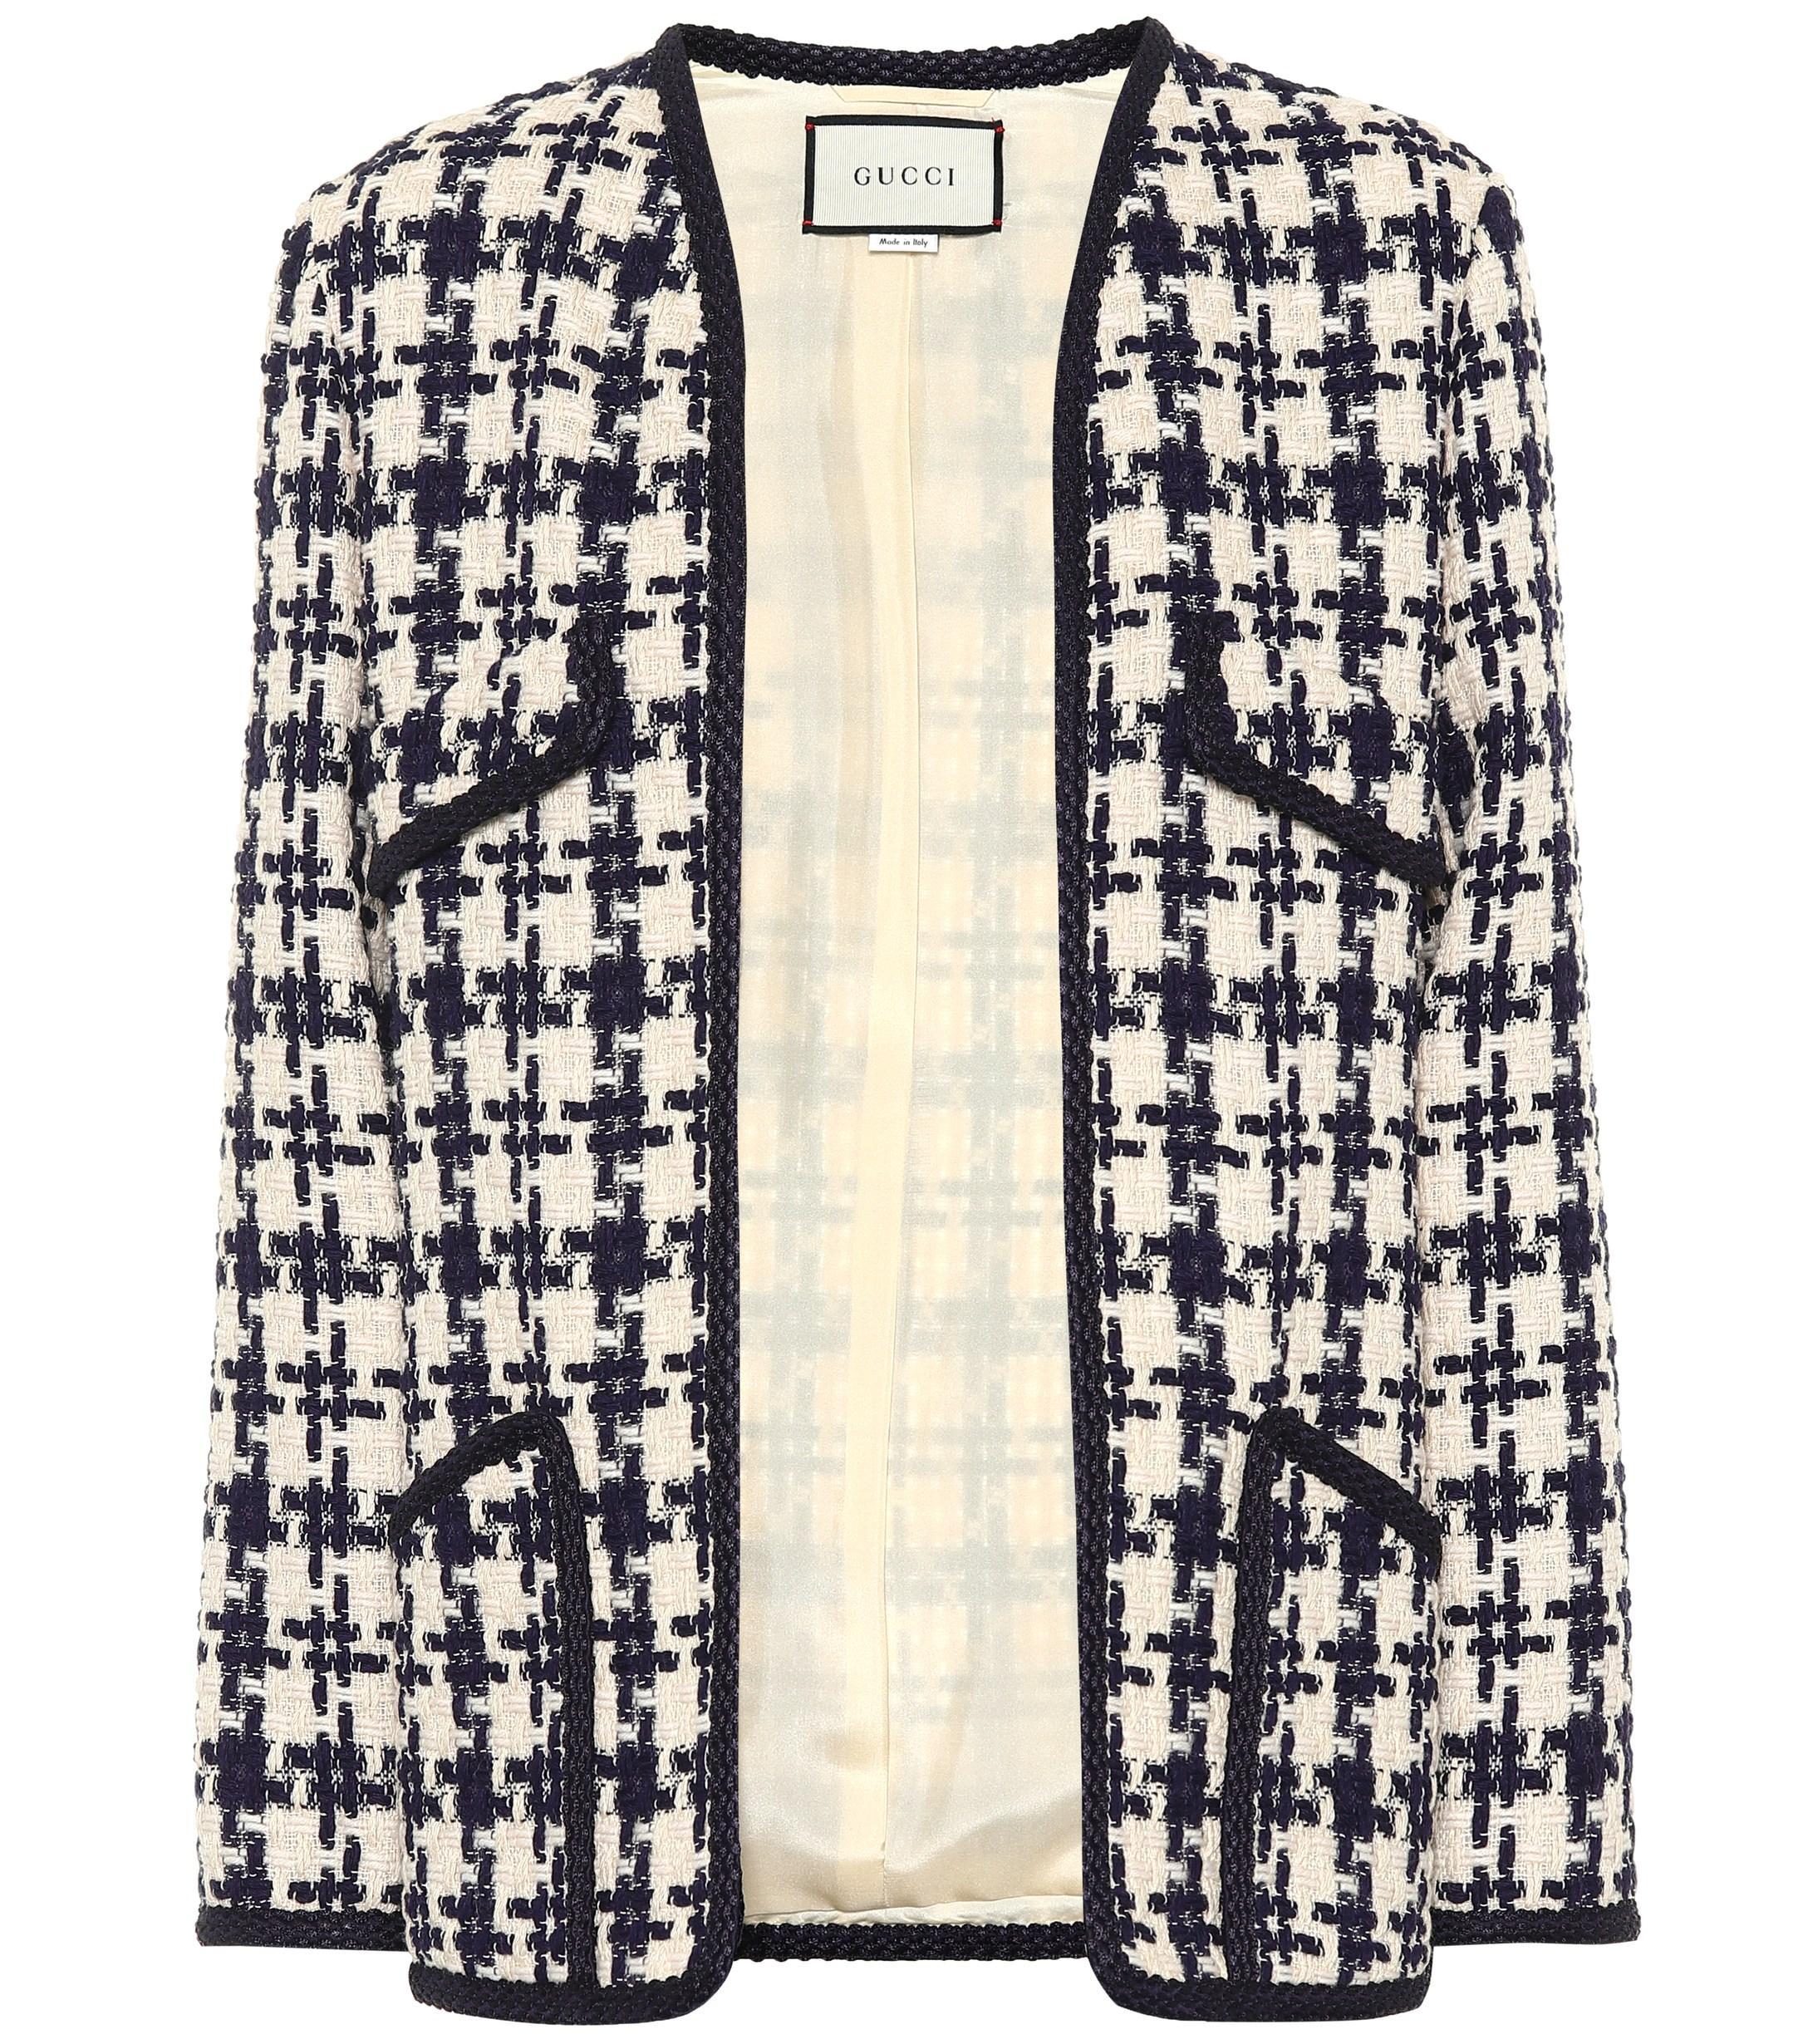 af05735d4e86c9 Gucci - Blue Houndstooth Tweed Wool-blend Jacket - Lyst. View fullscreen